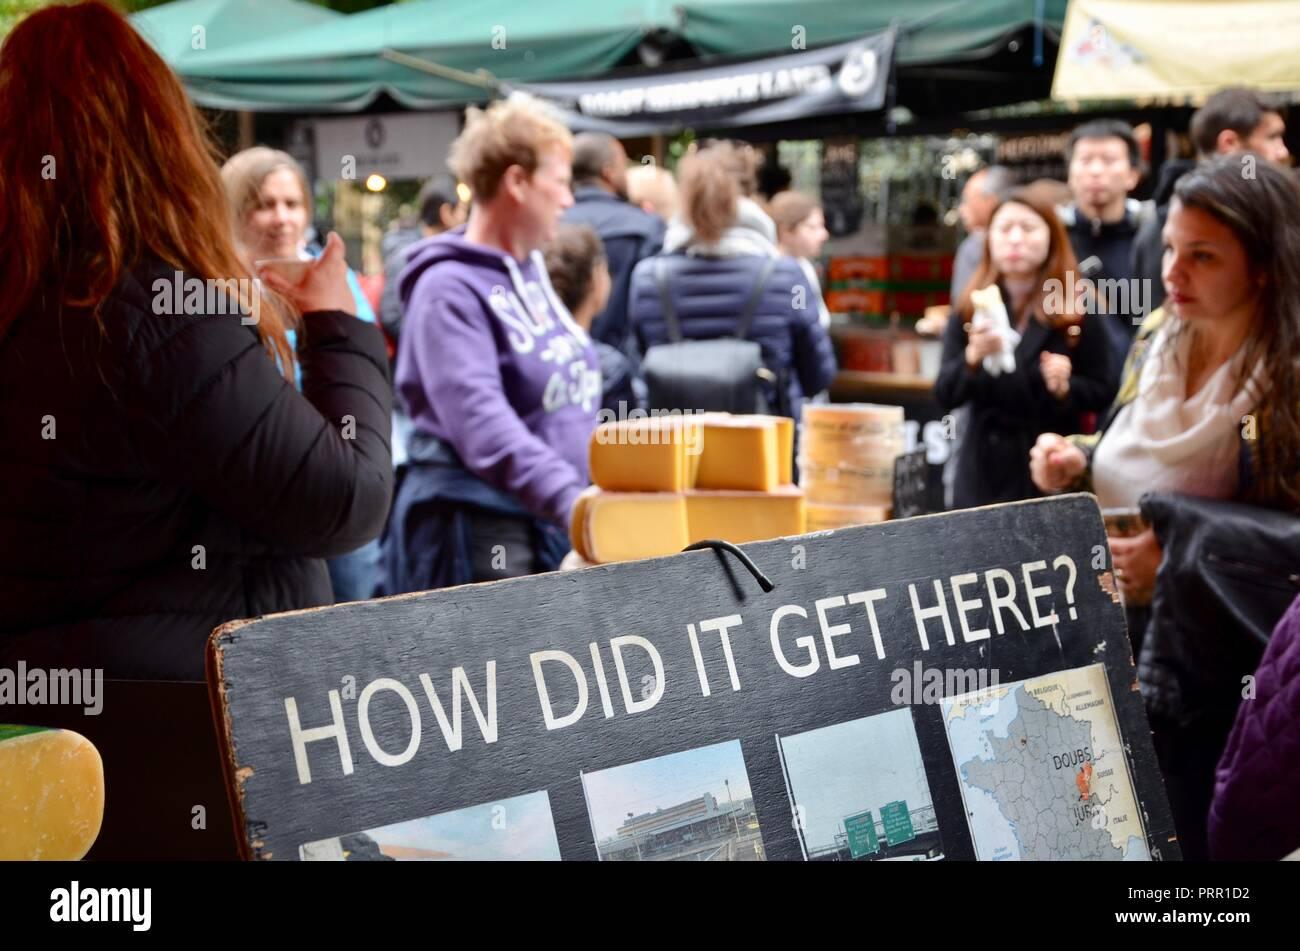 Cheese stall with sign showing provenance, Borough Market, Southwark, London, England, UK. - Stock Image